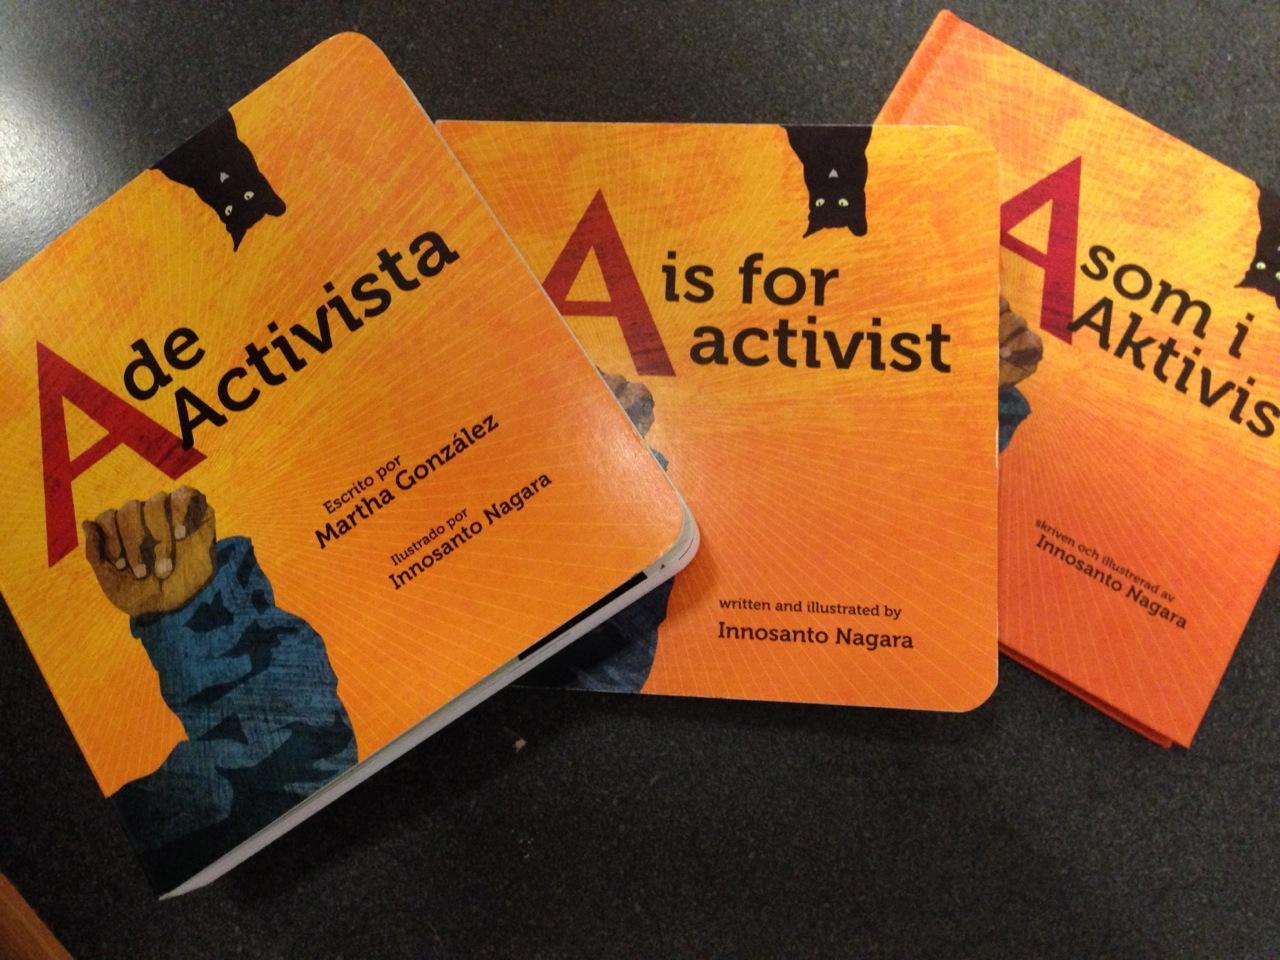 Innosanto Nagara - A is for Activist